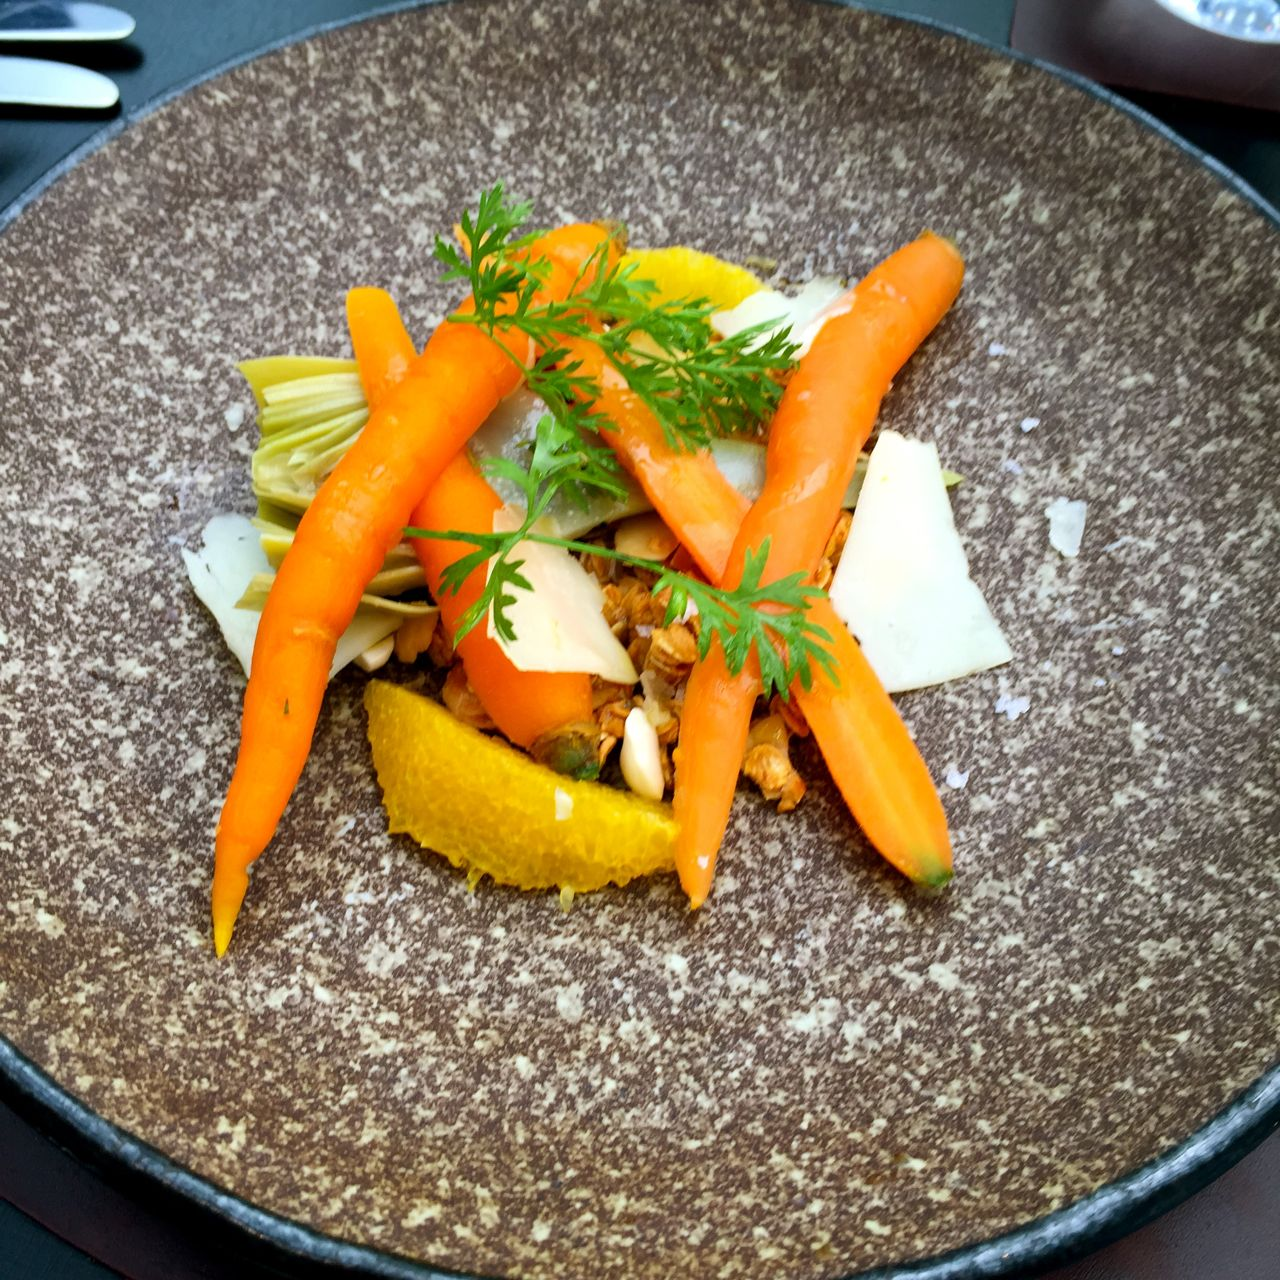 Carrot and Citrus Starter